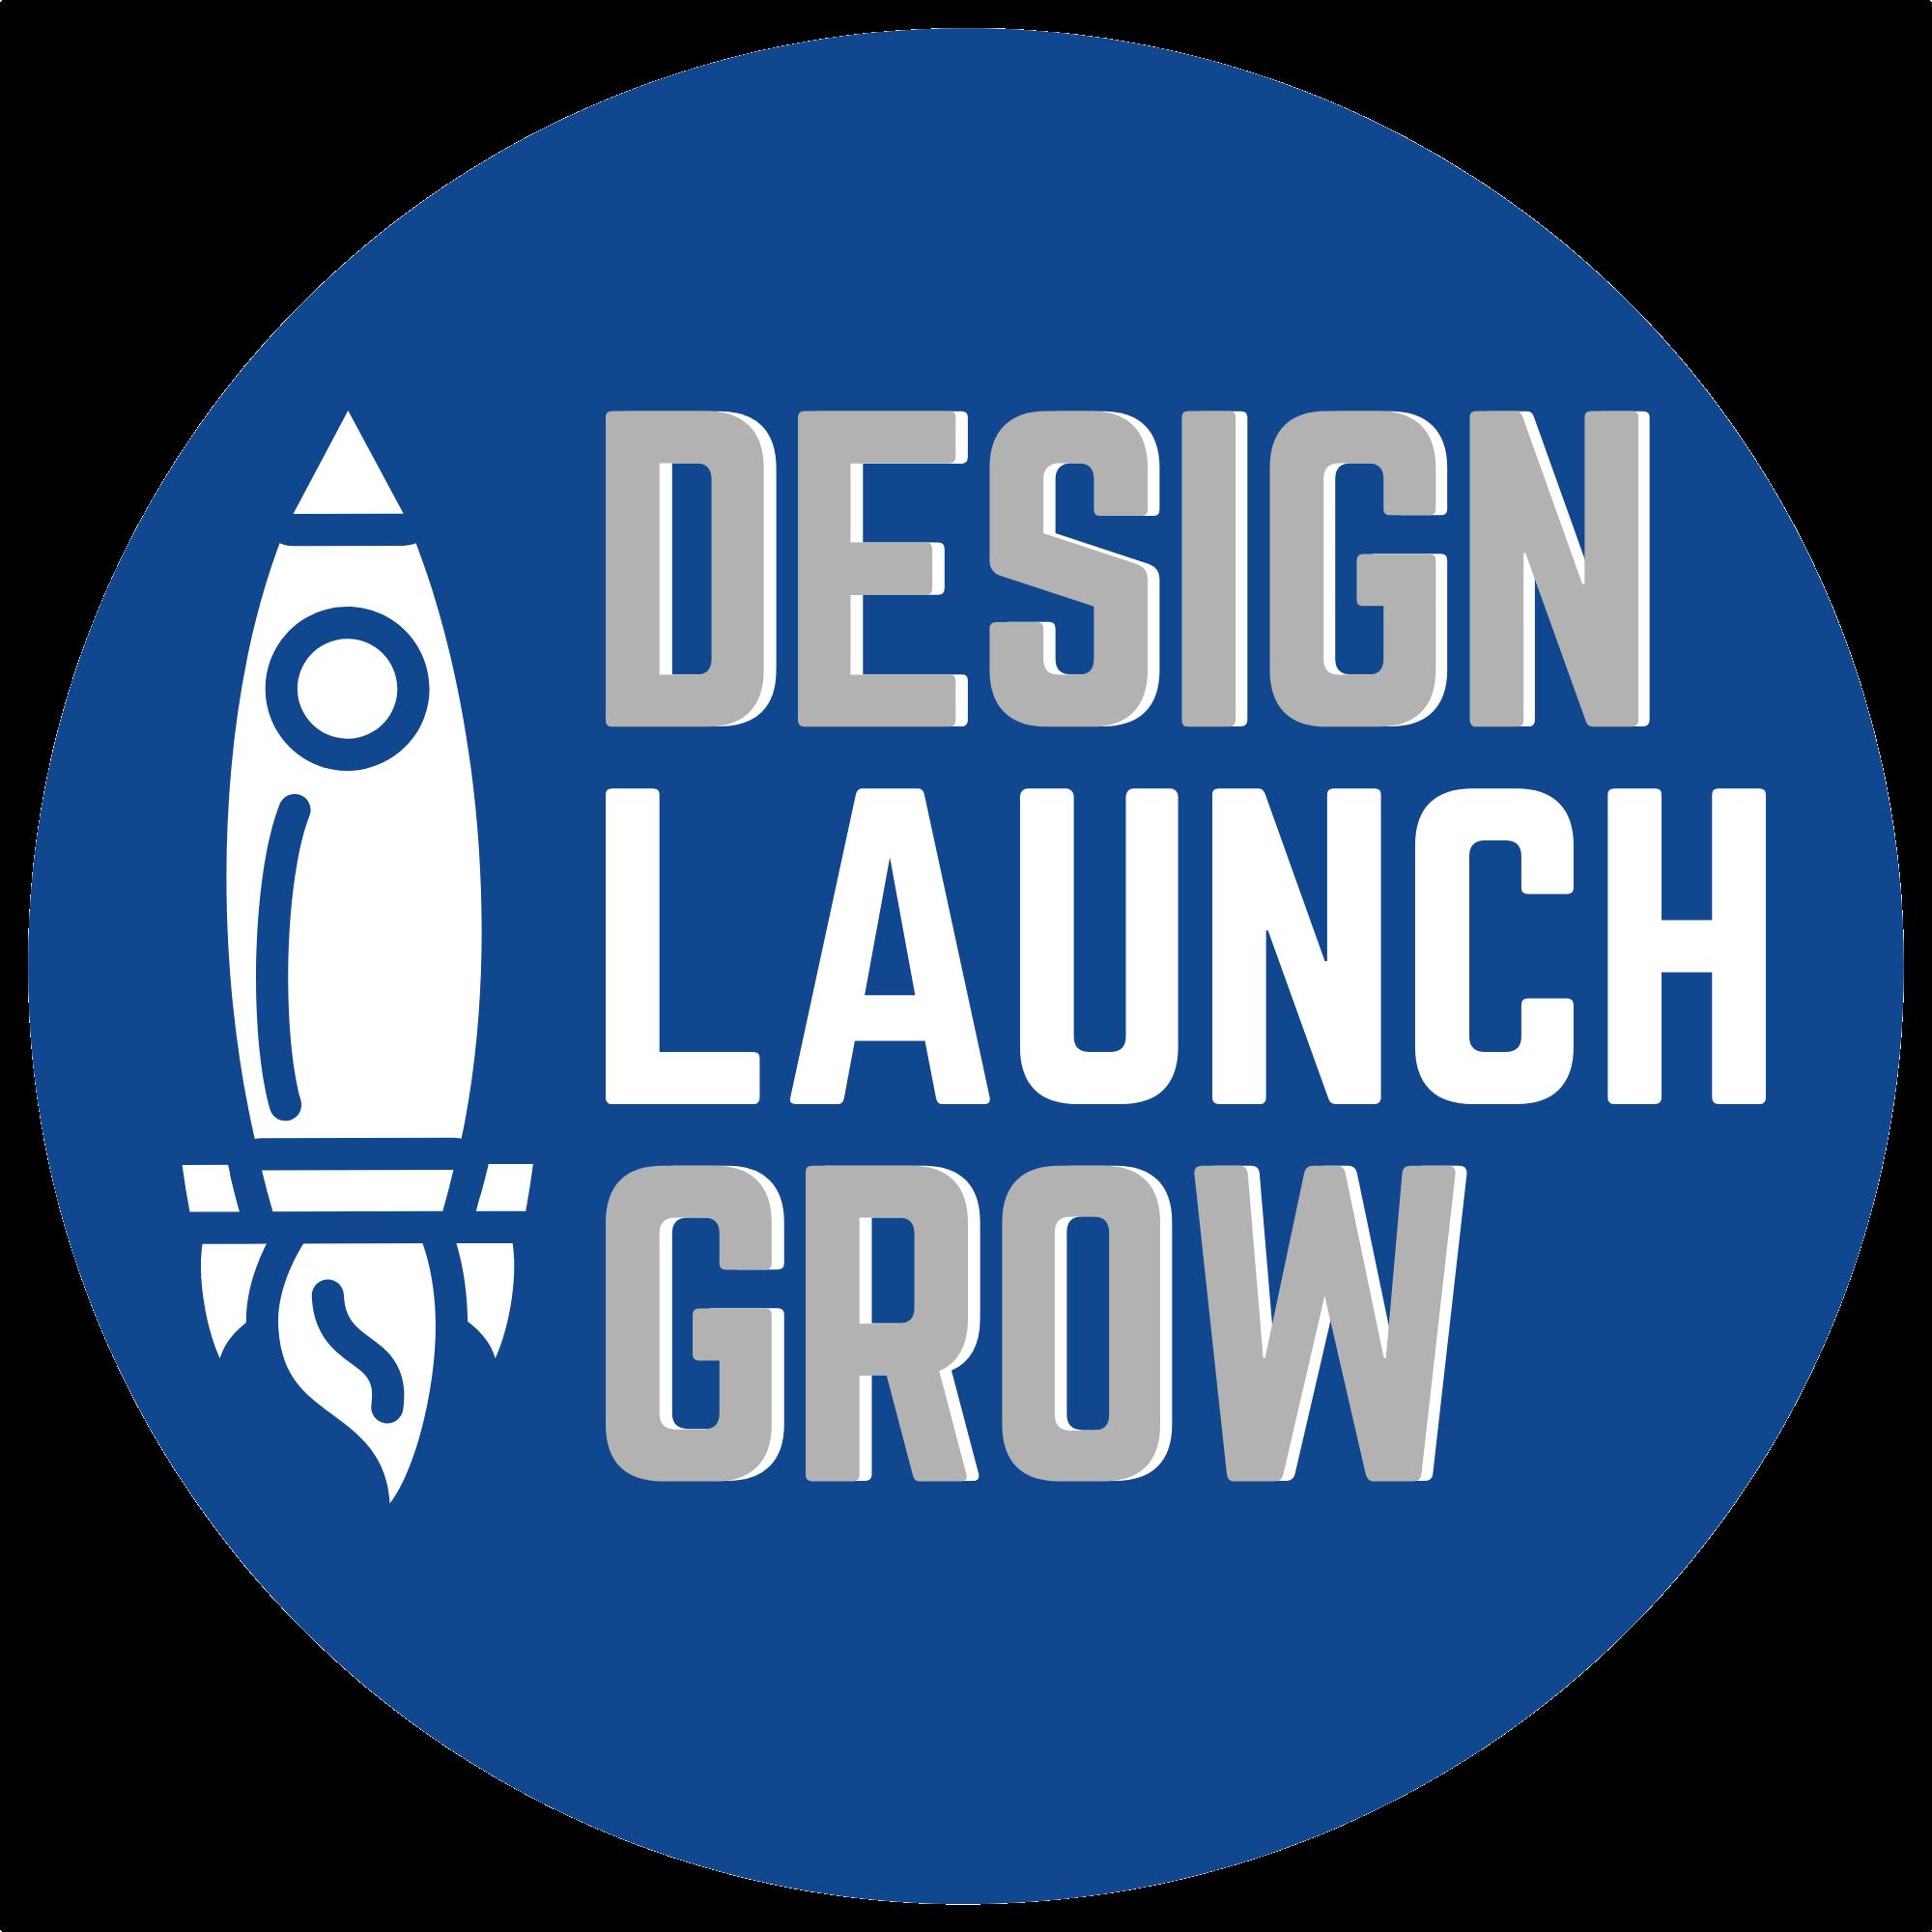 Design Launch Grow